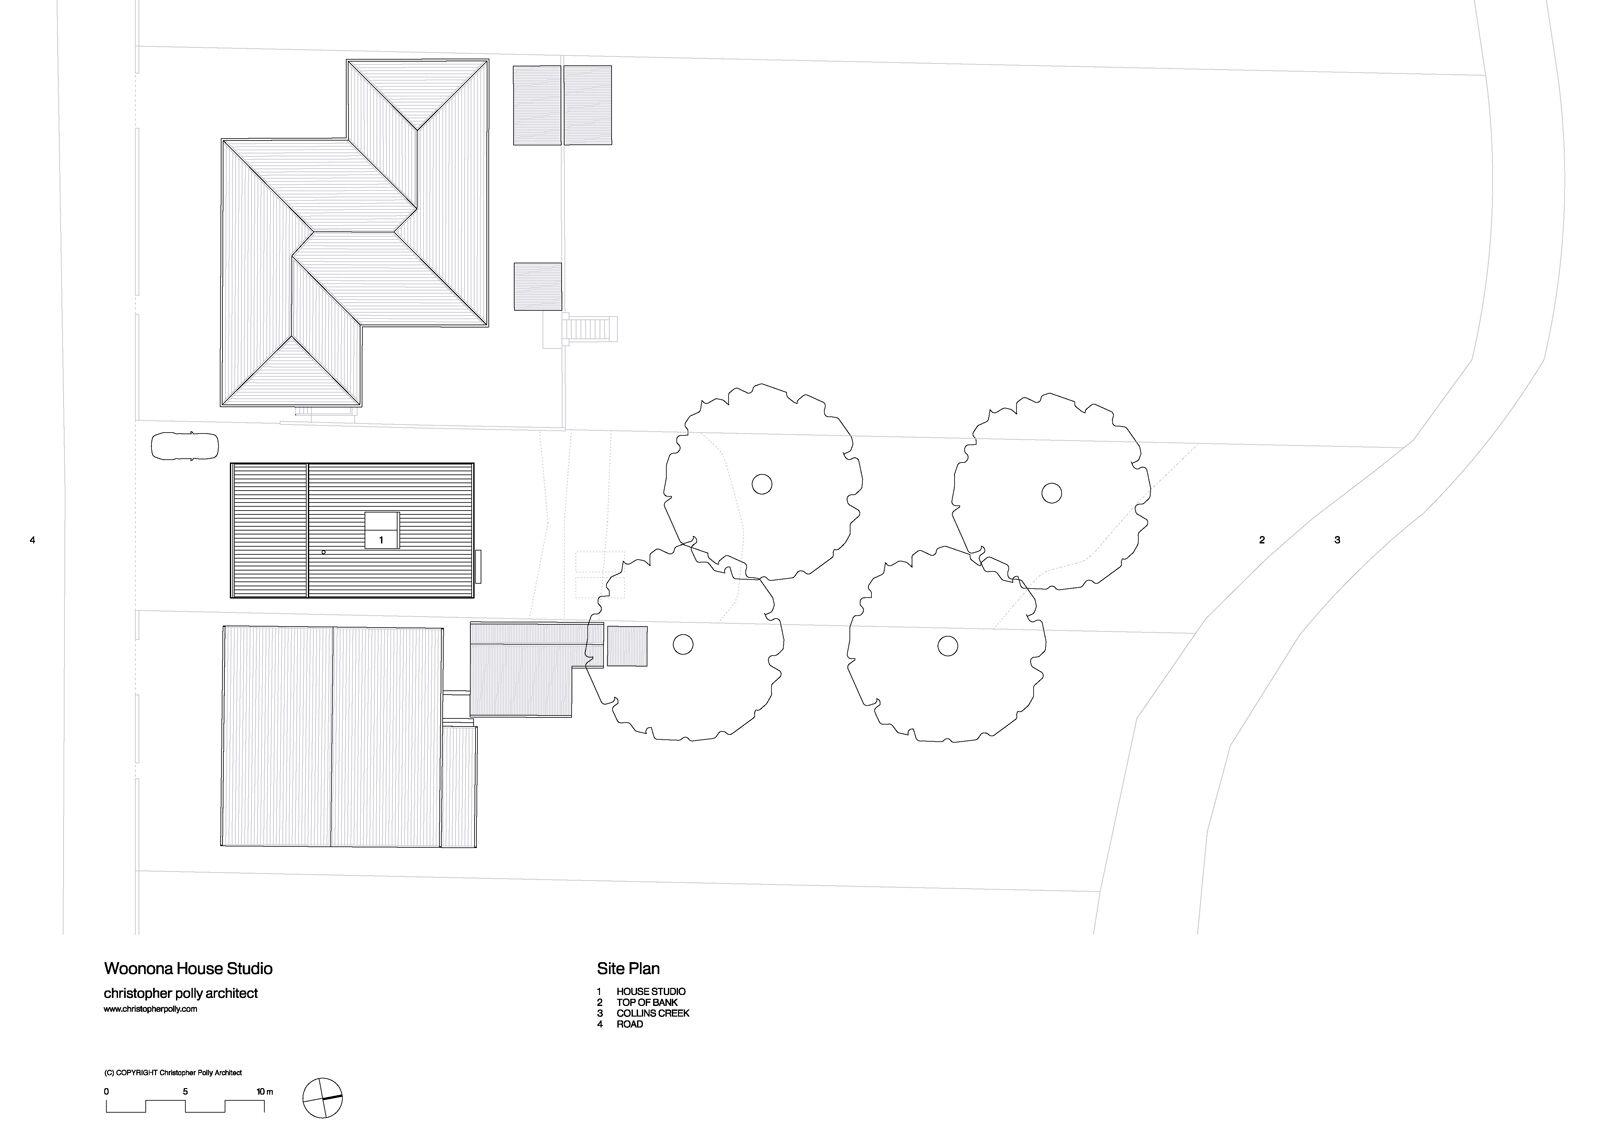 Christopher Polly Architect - Woonona House Studio - Site Plan